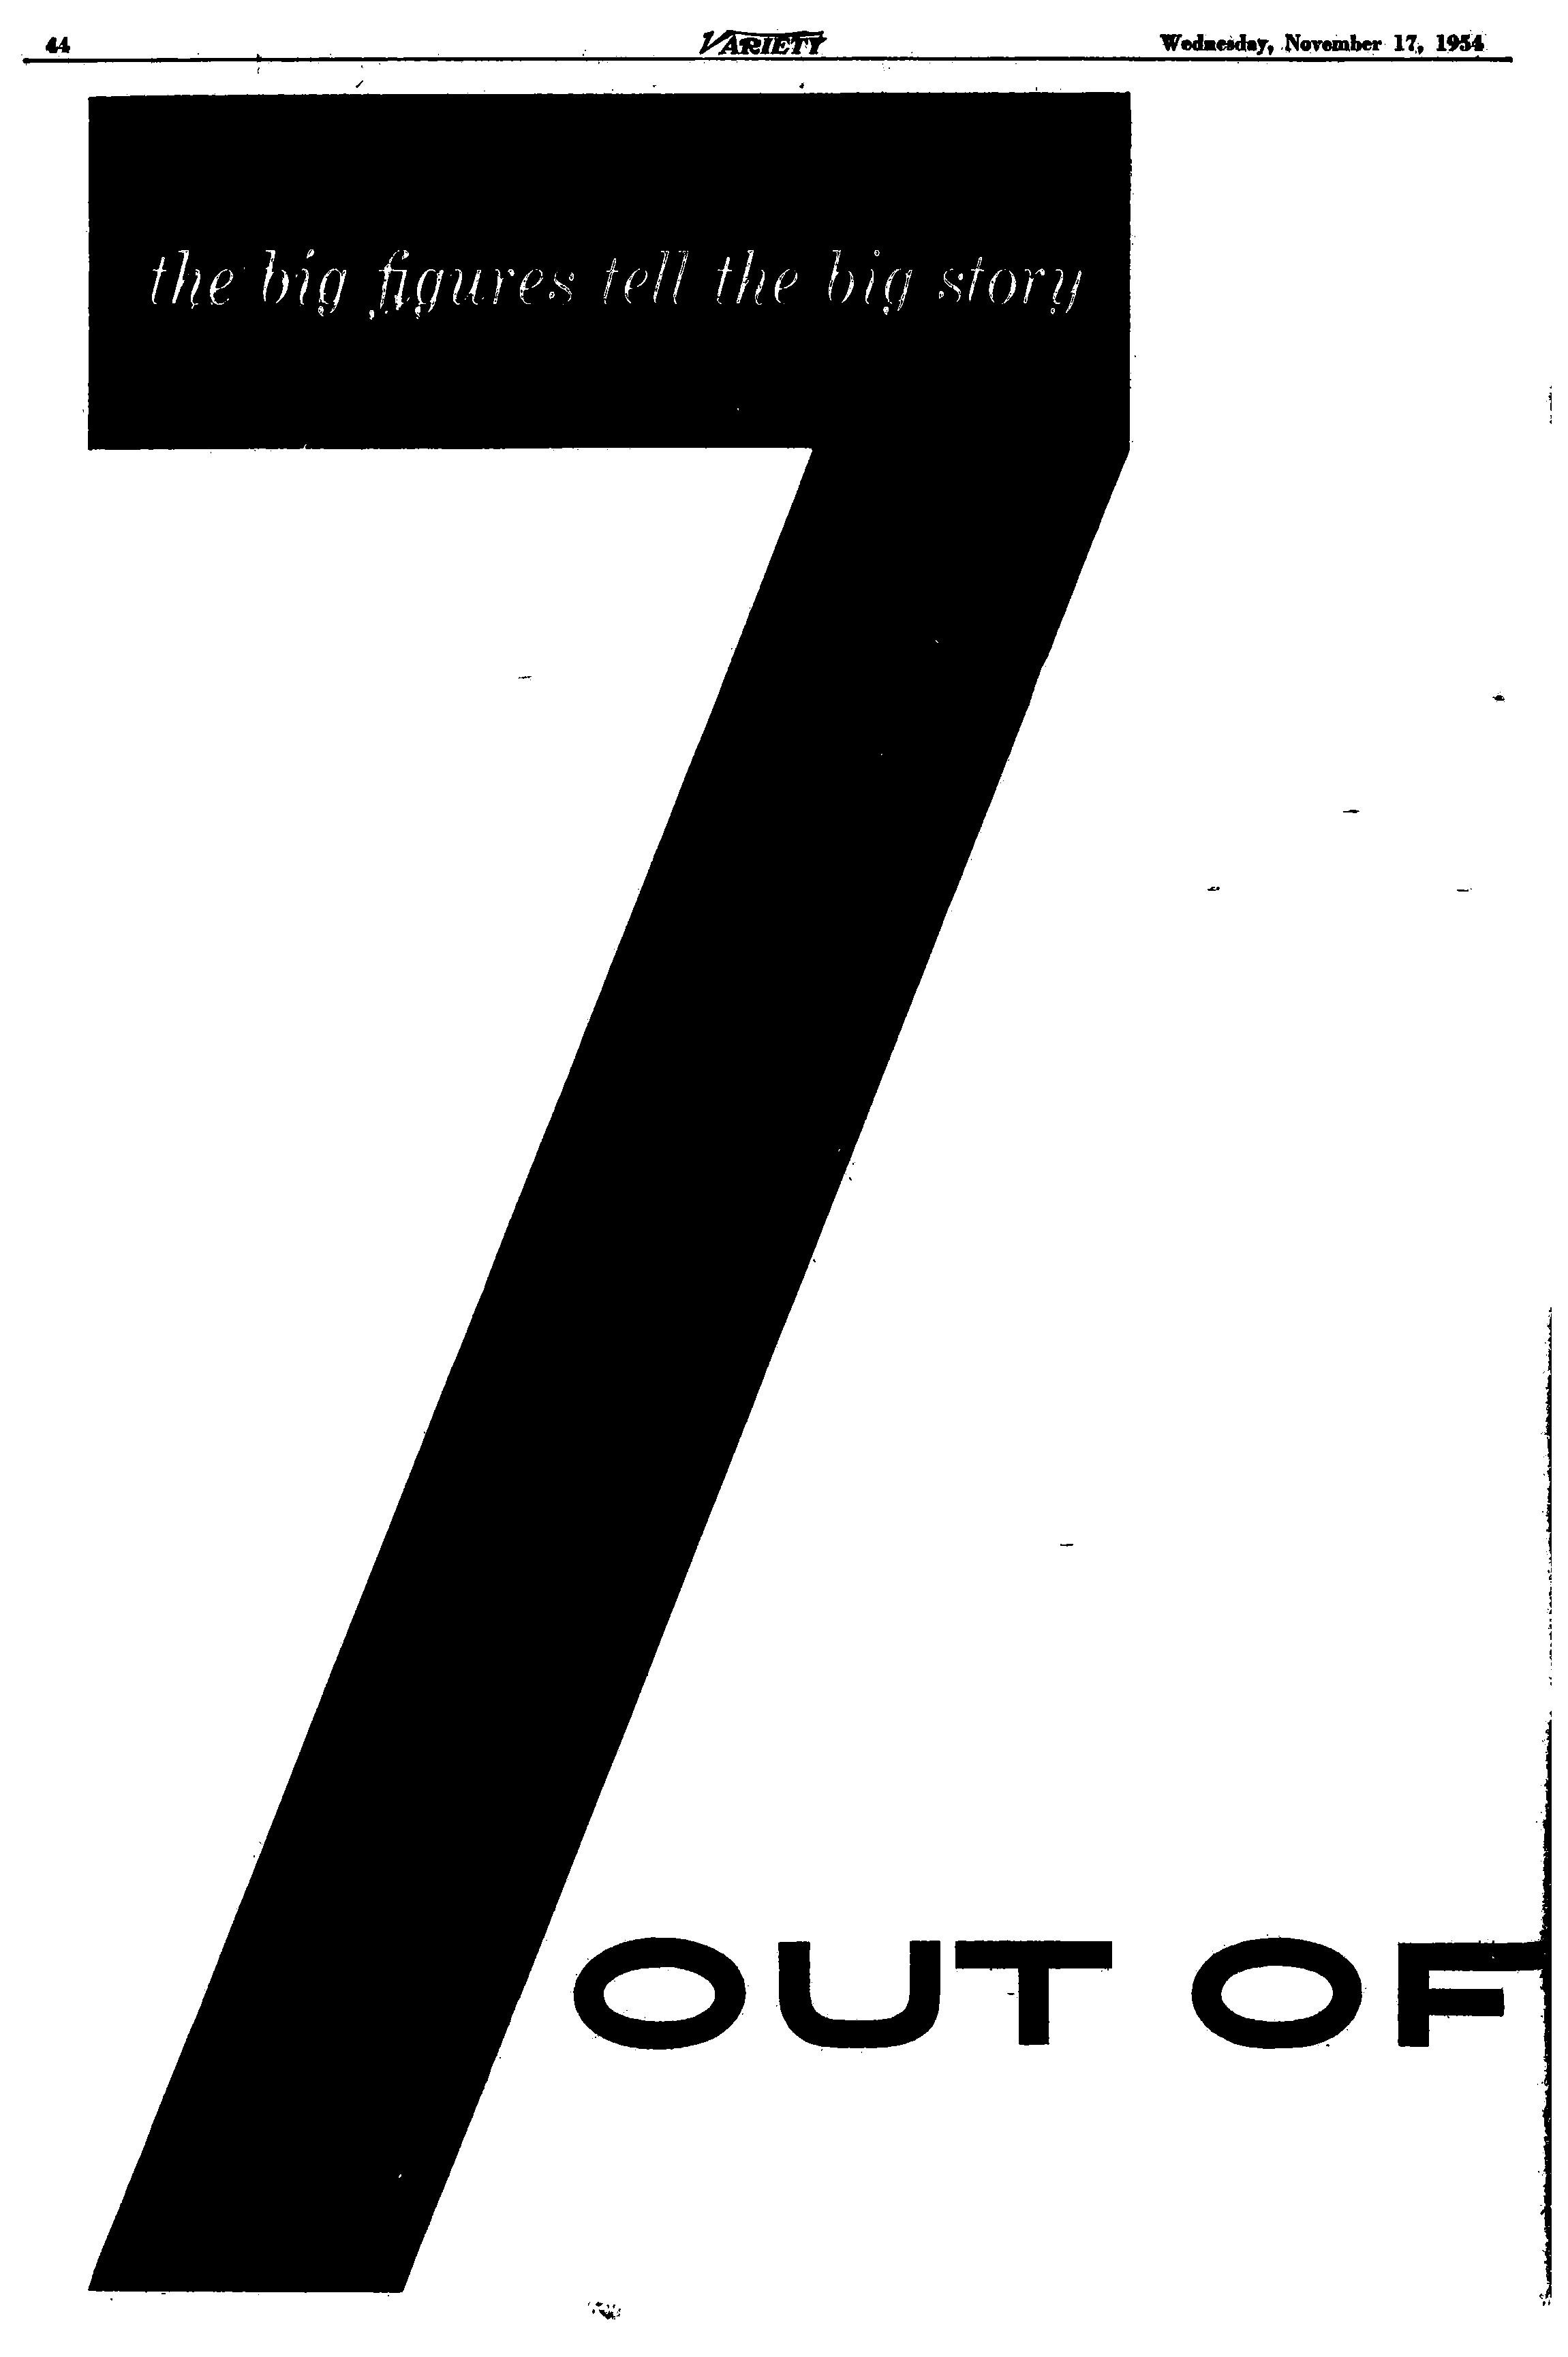 Variety196-1954-11_jp2.zip&file=variety196-1954-11_jp2%2fvariety196-1954-11_0179